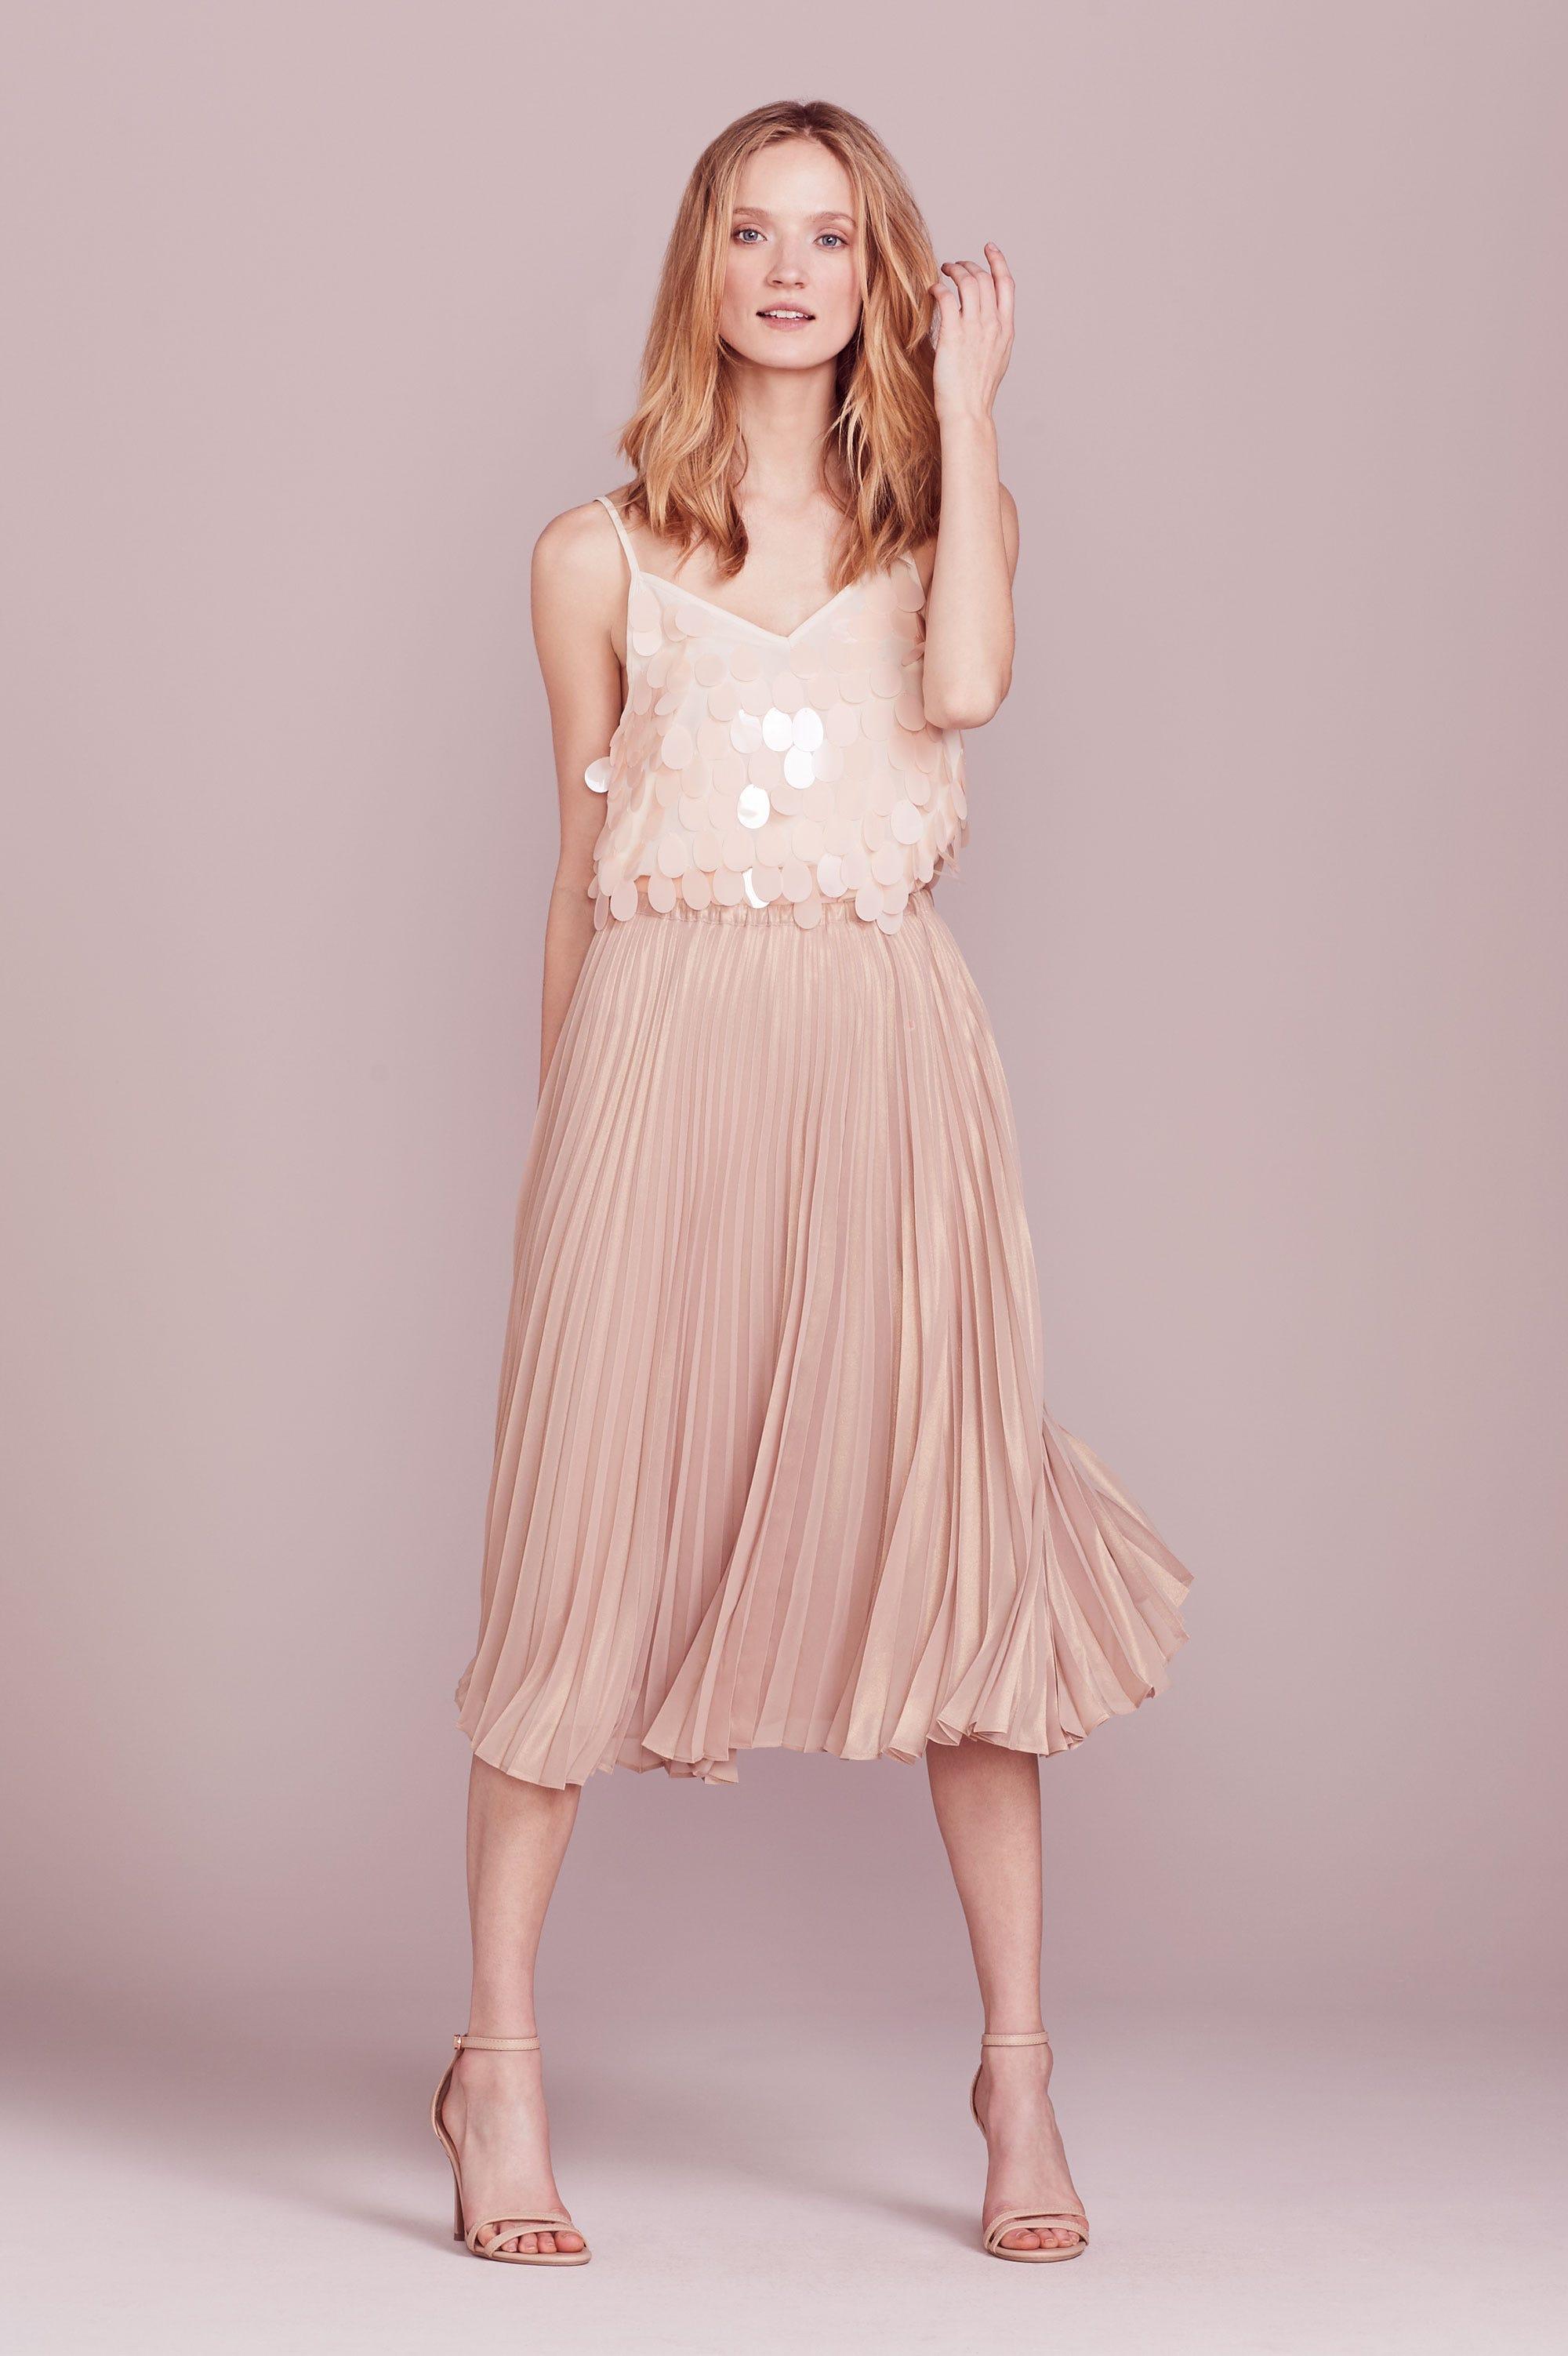 Fein Xo Prom Dresses Ideen - Brautkleider Ideen - cashingy.info